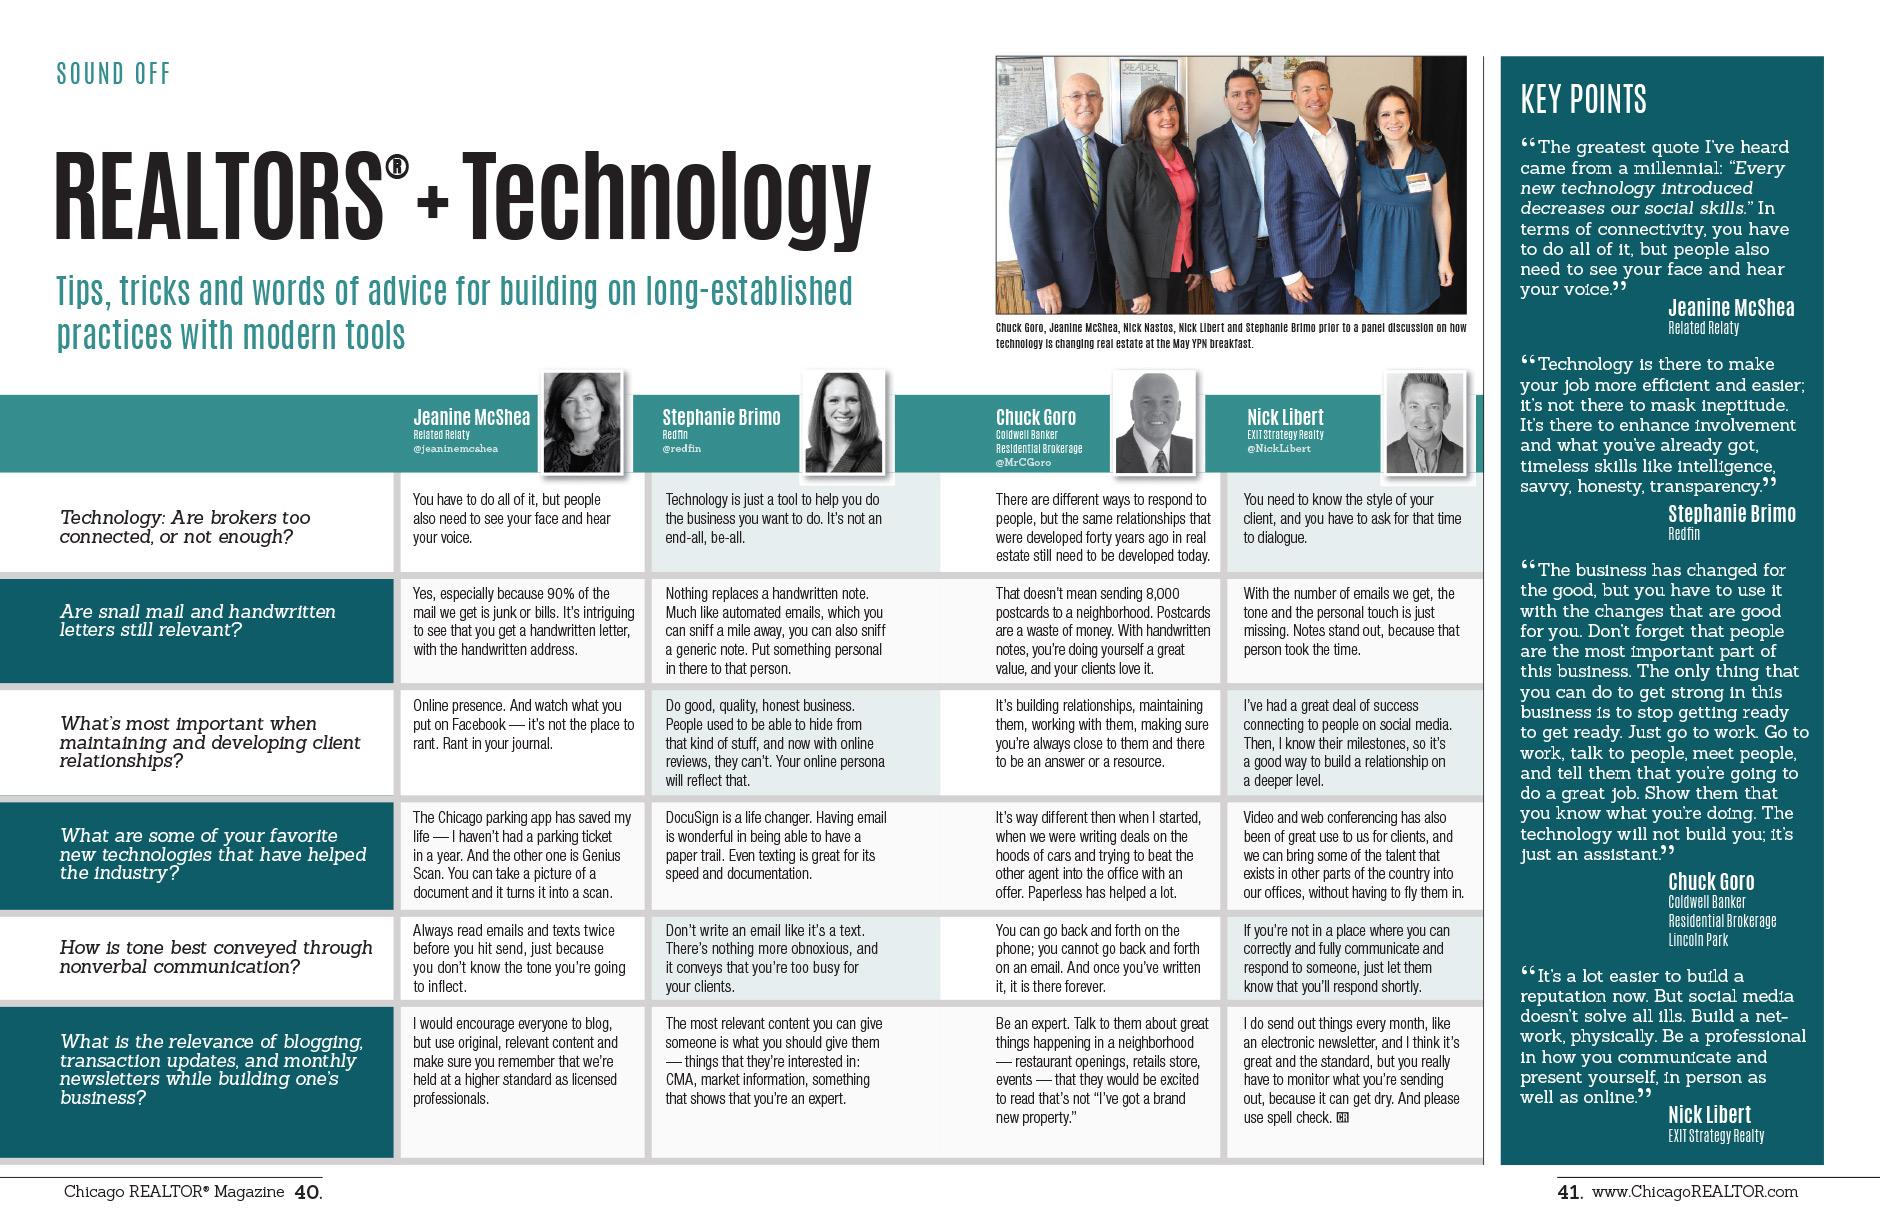 REALTORS+Technology_1880w